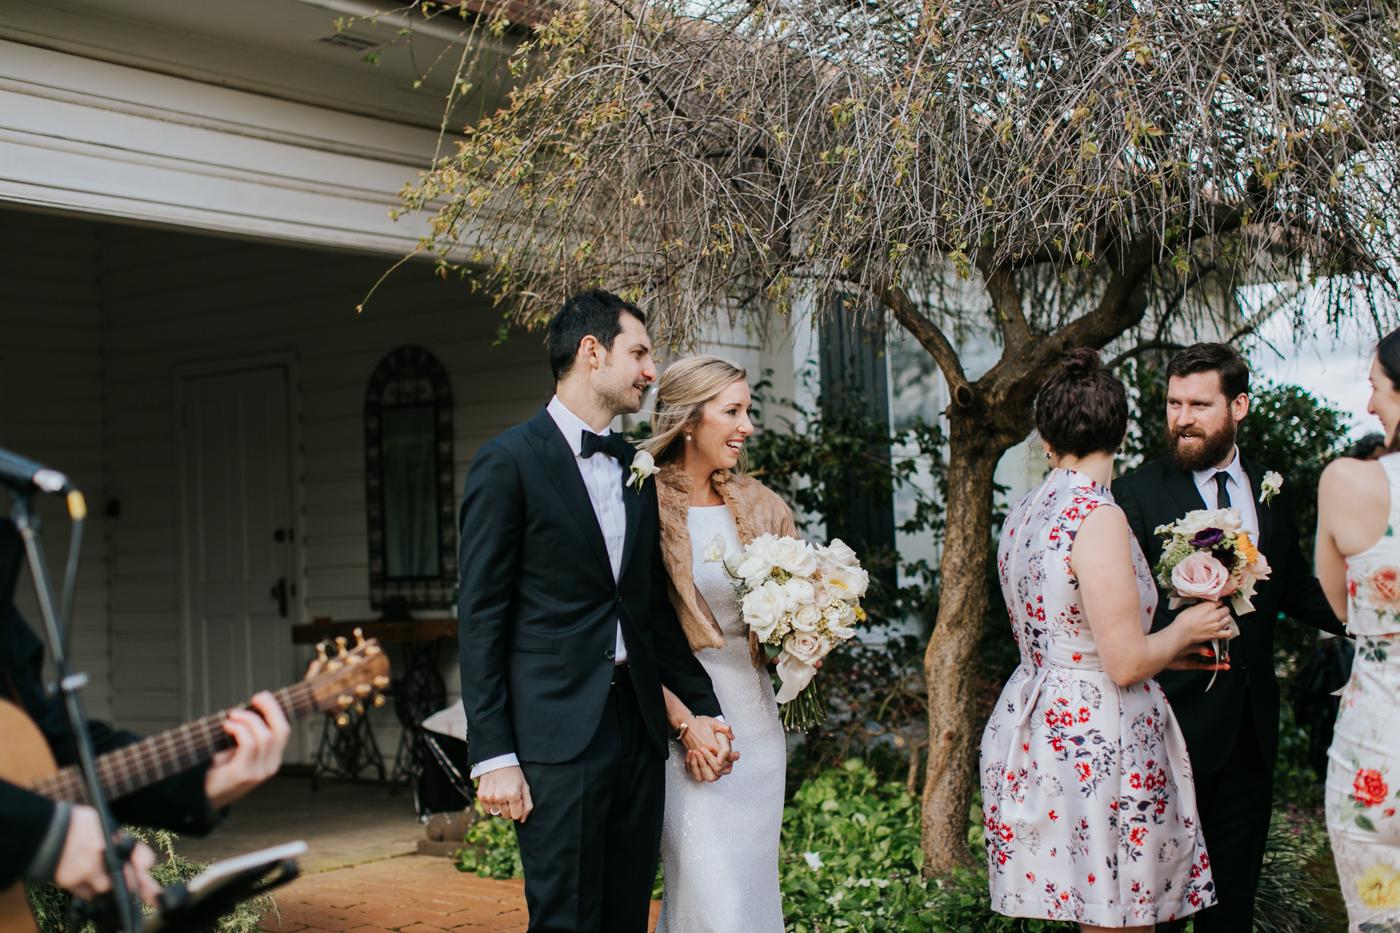 Bridget & James - Orange Country Wedding - Samantha Heather Photography-60.jpg